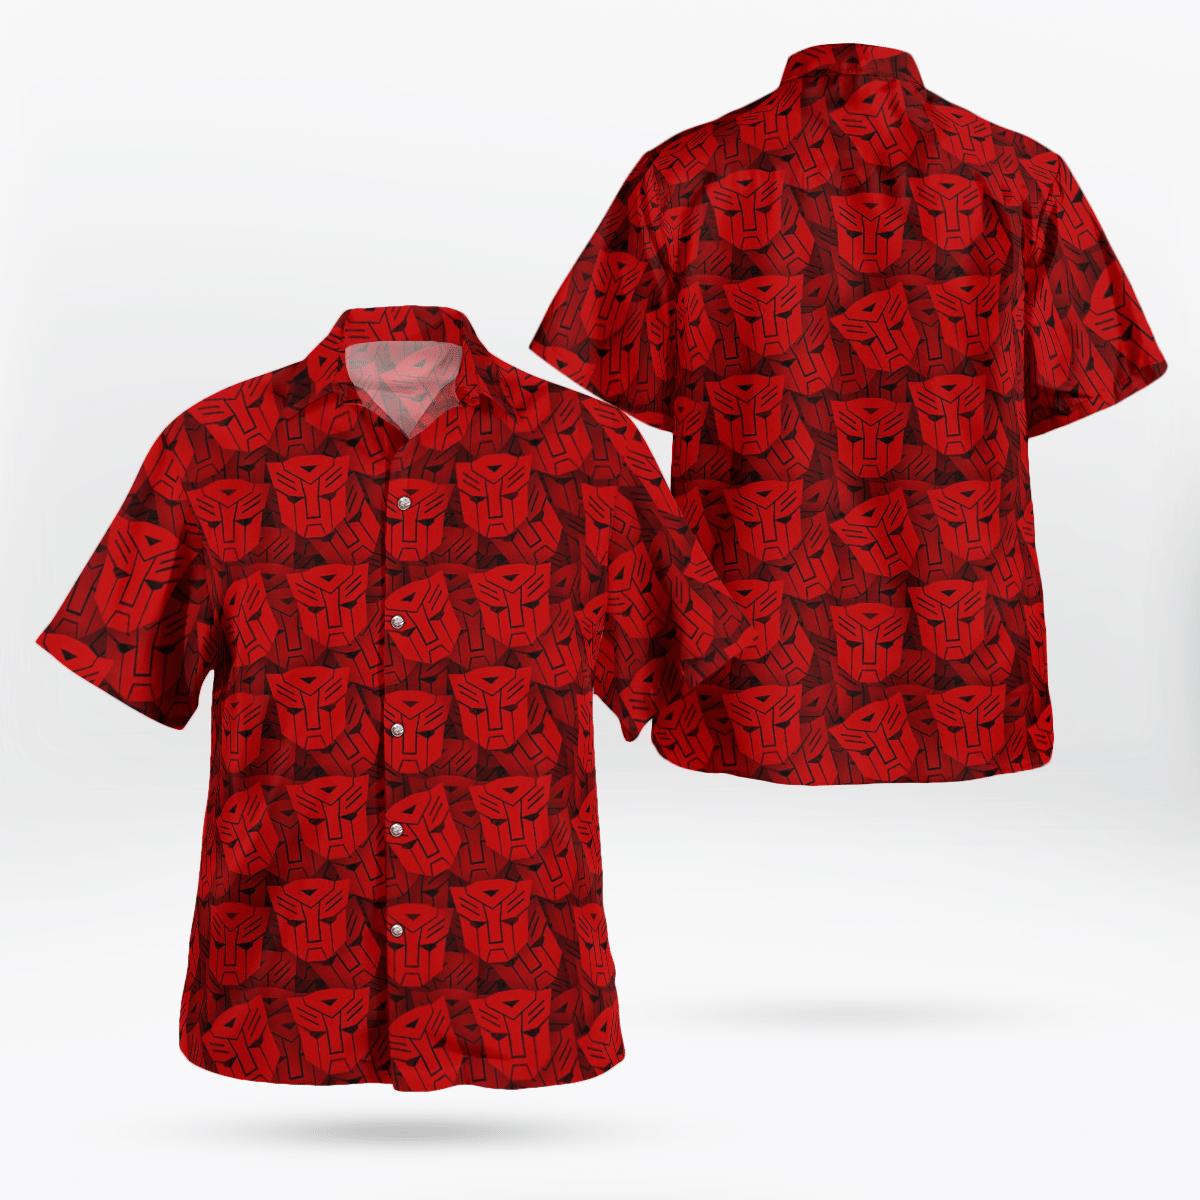 Transformers Optimus Prime red face 3D T-shirt and Hawaiian Shirt